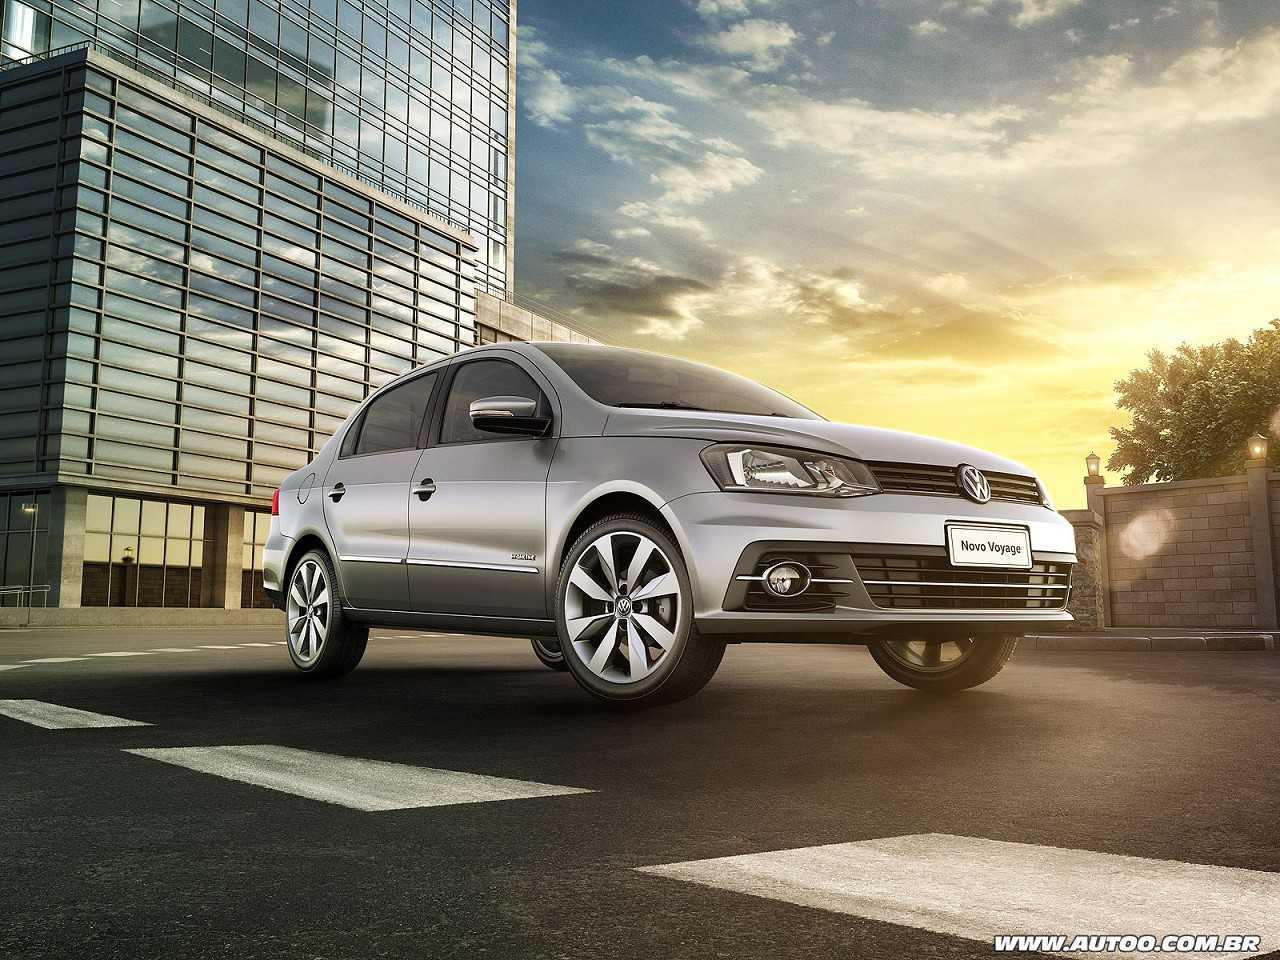 VolkswagenVoyage 2017 - ângulo frontal